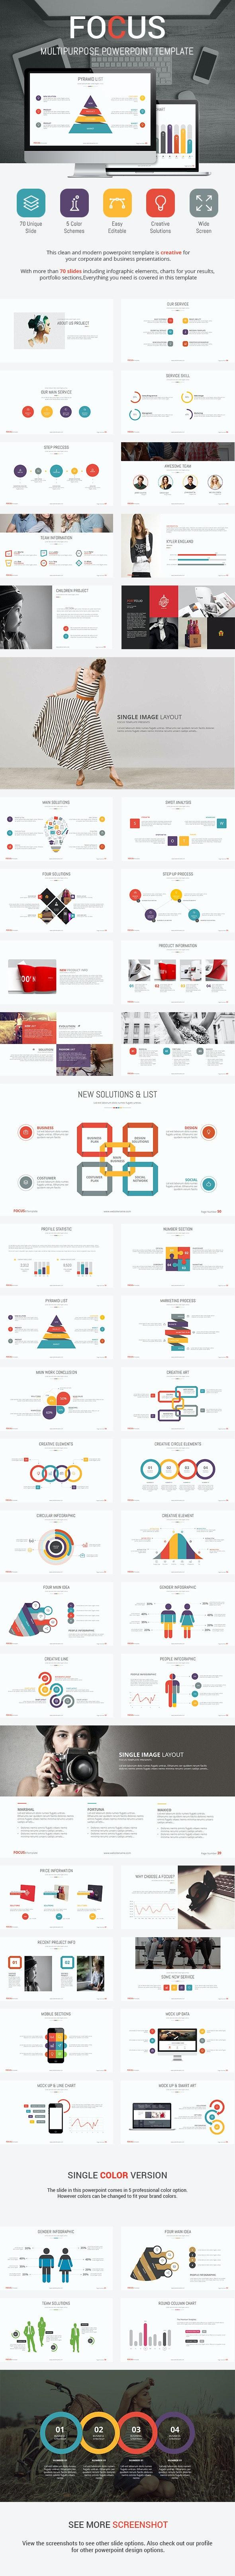 Focus - Presentation Template - Business PowerPoint Templates